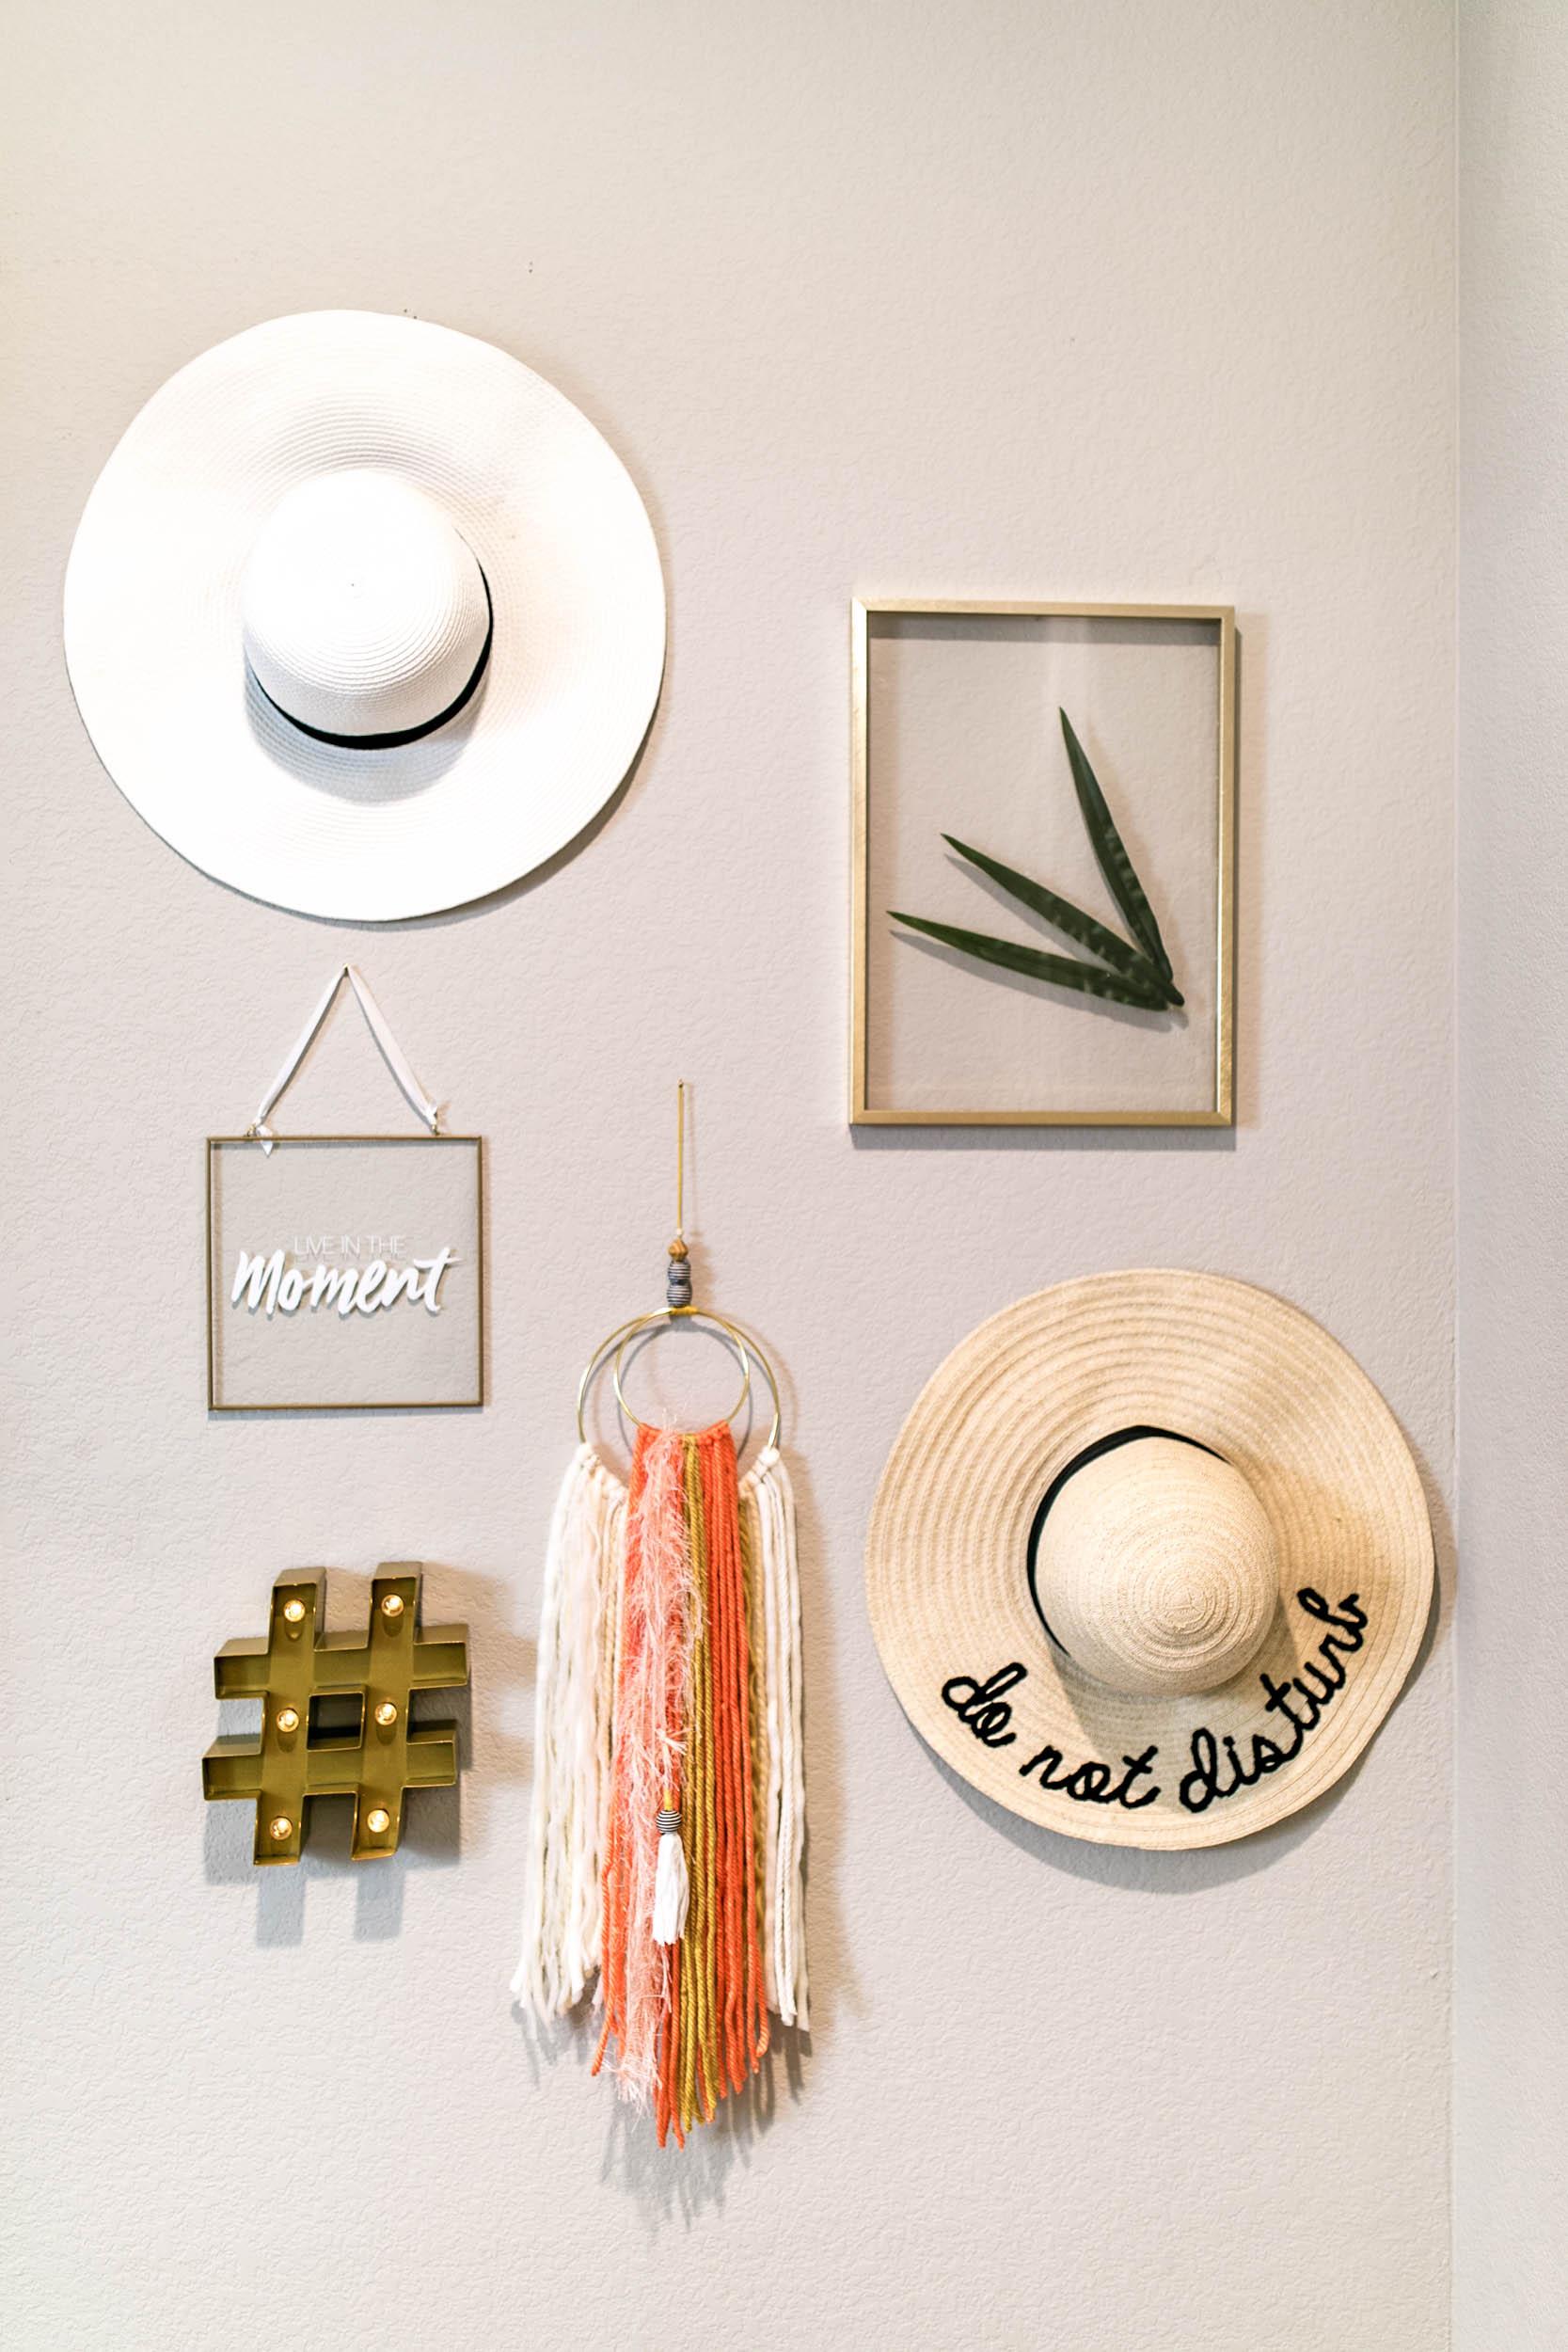 SUPER EASY Wall Hanging DIY   yarn wall hanging   Fringe Wall hanging   macrame wall hanging   macrame wall hanging diy   yarn wall hanging diy tutorials   Never Skip Brunch by Cara Newhart   #neverskipbrunch #DIY #decor #yarn #boho